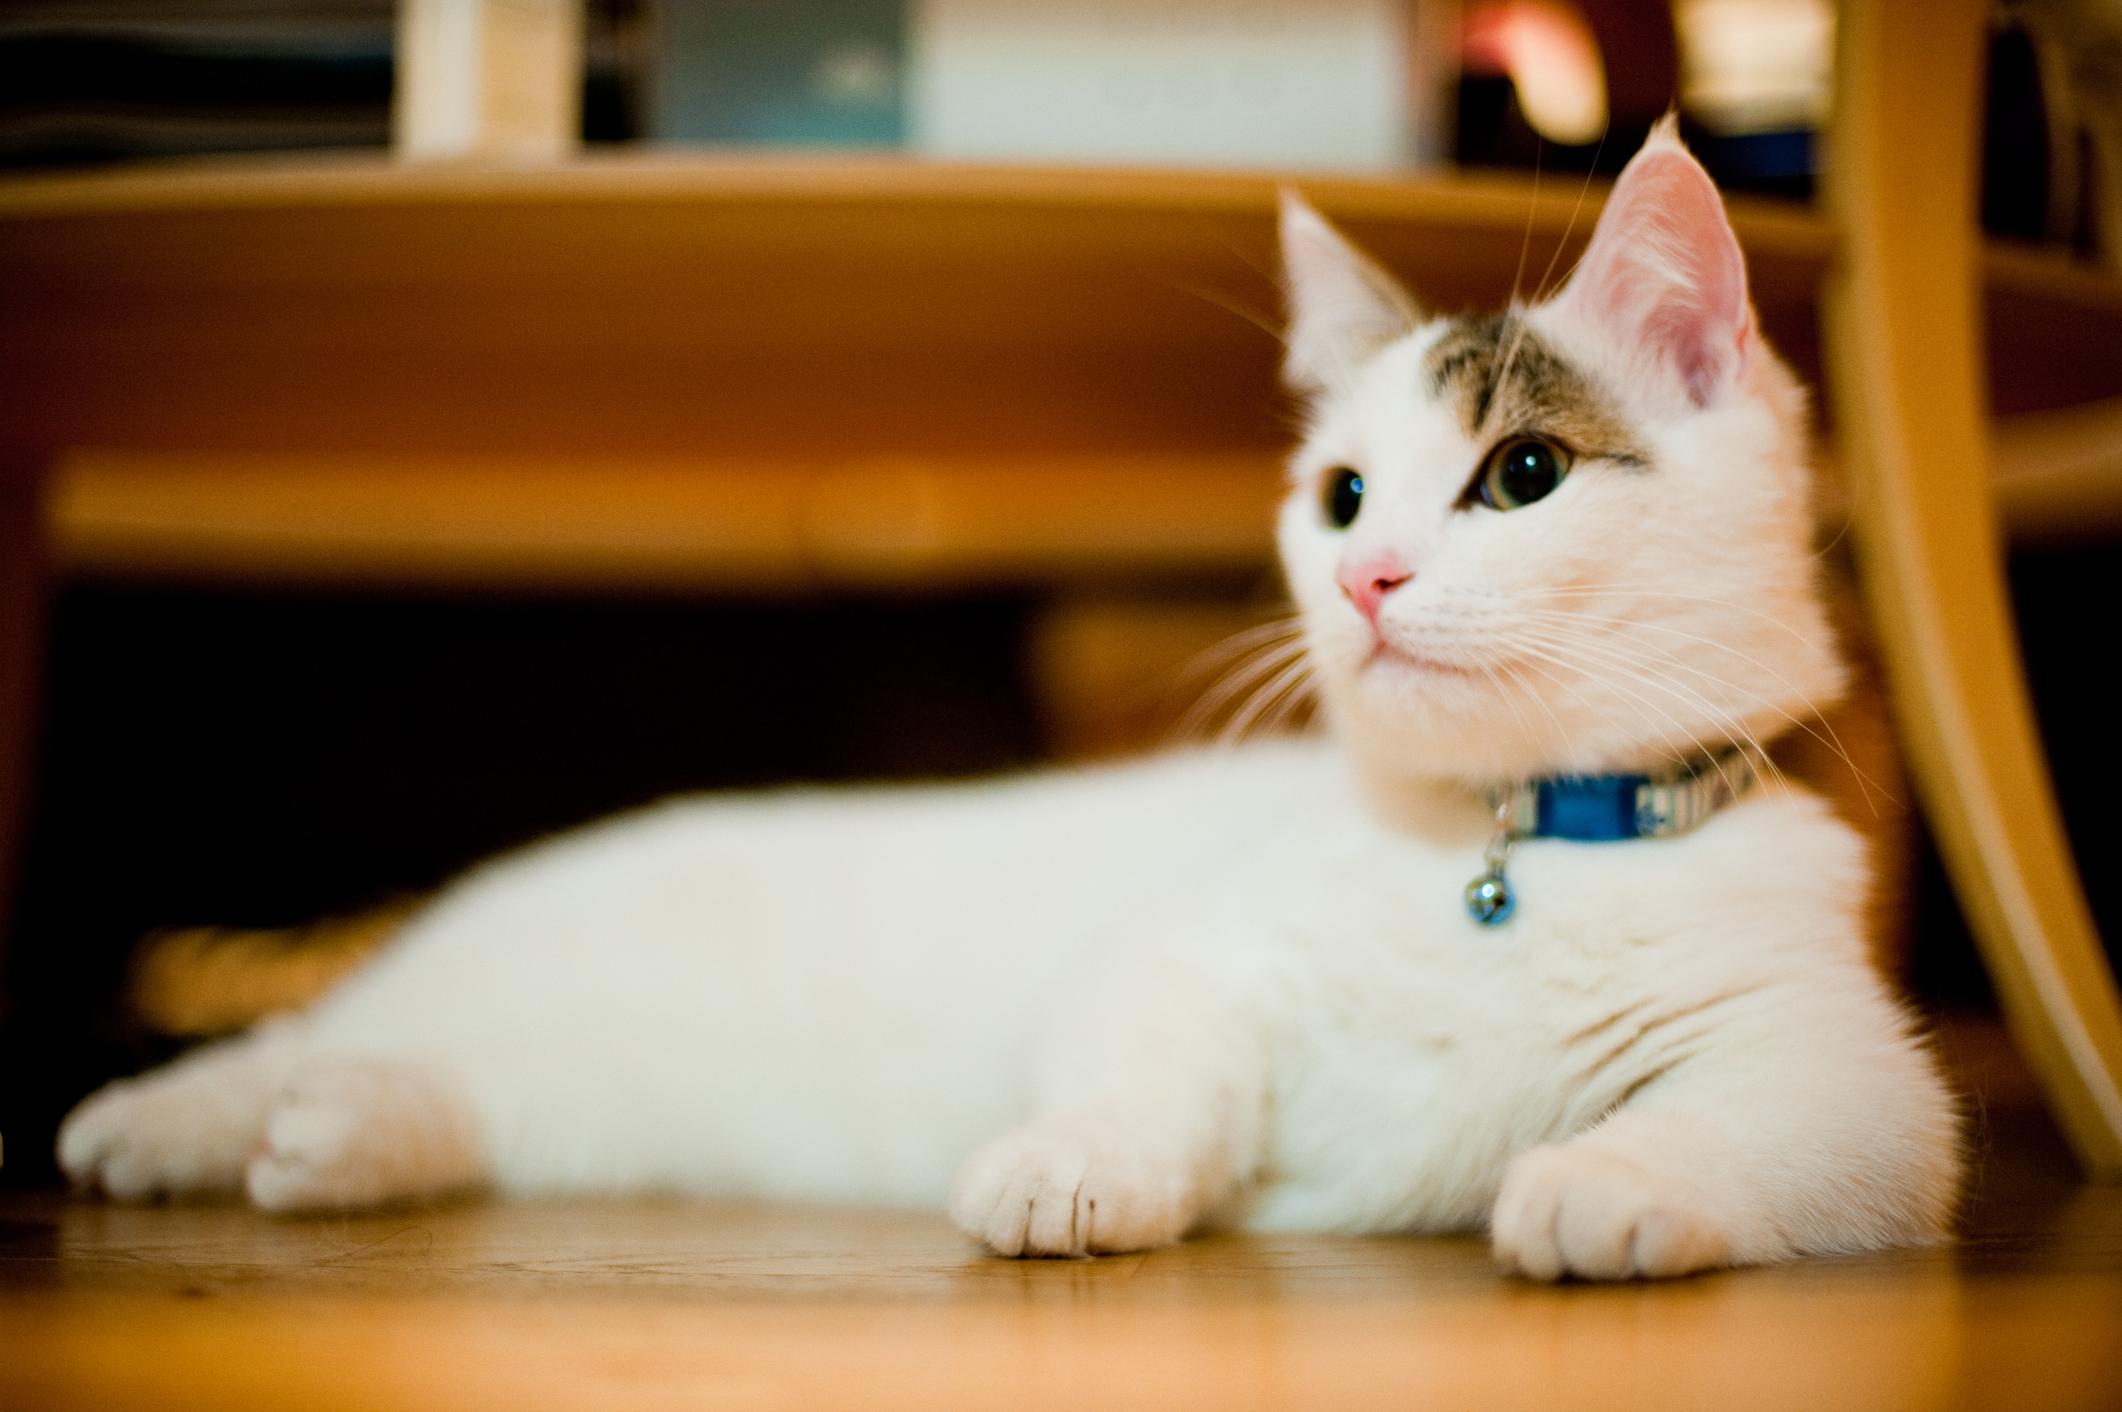 History and Characteristics of Munchkin Kittens | LoveToKnow